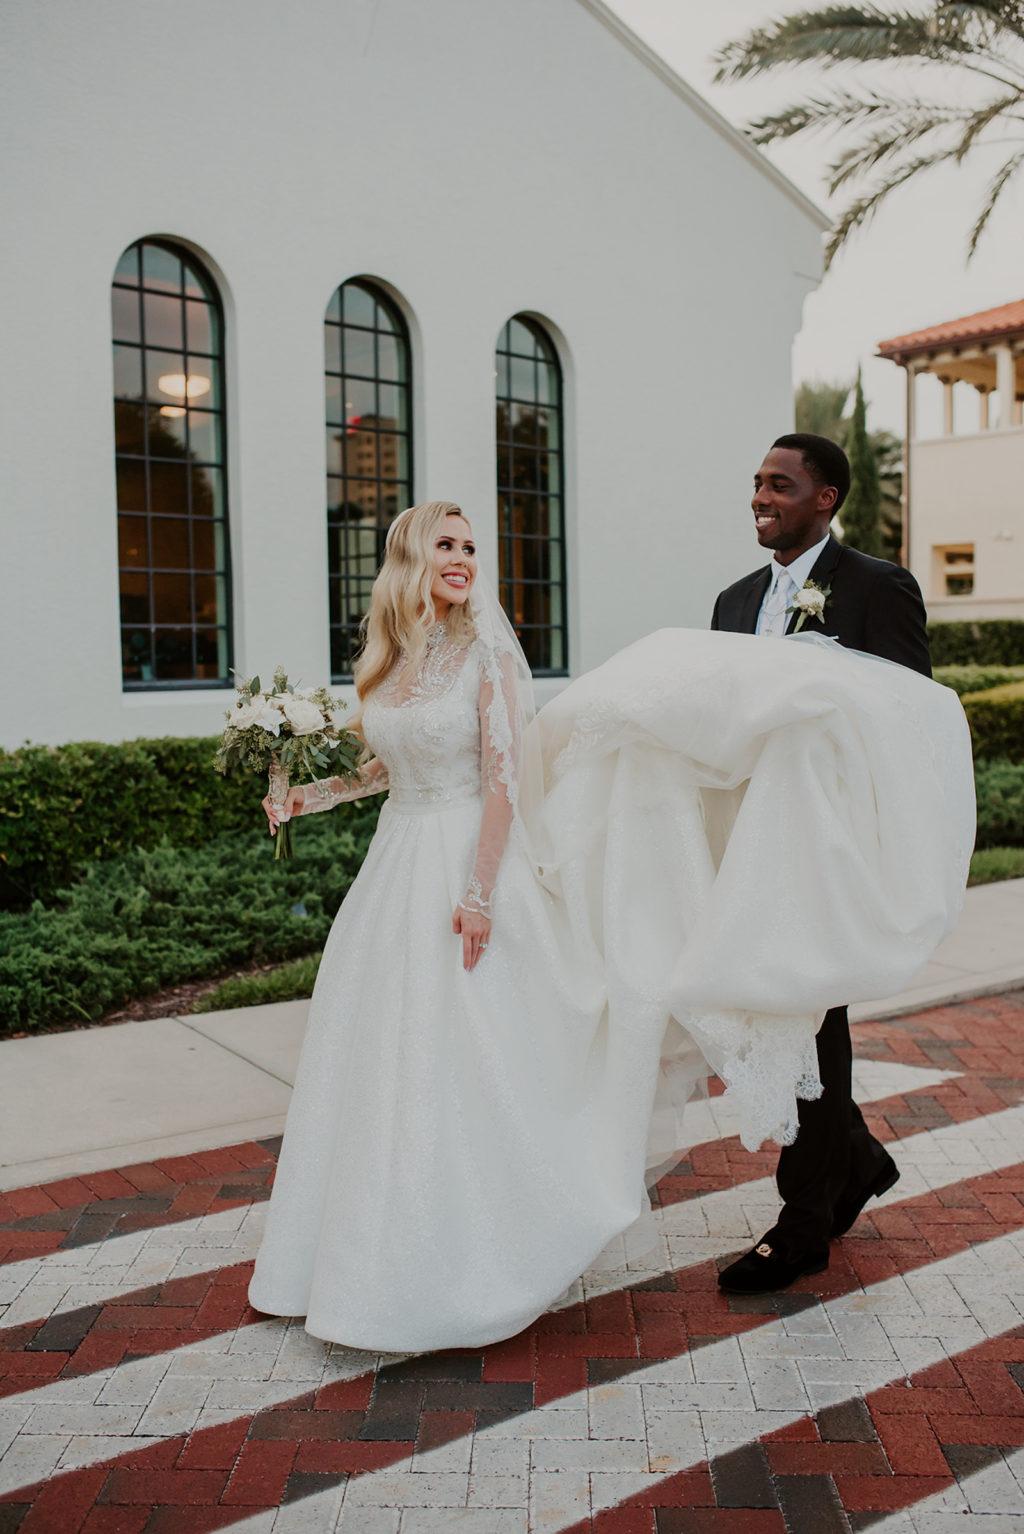 Timeless Elegant Bride and Groom Holding Wedding Dress Train   Tampa Bay Wedding Venue Westshore Yacht Club